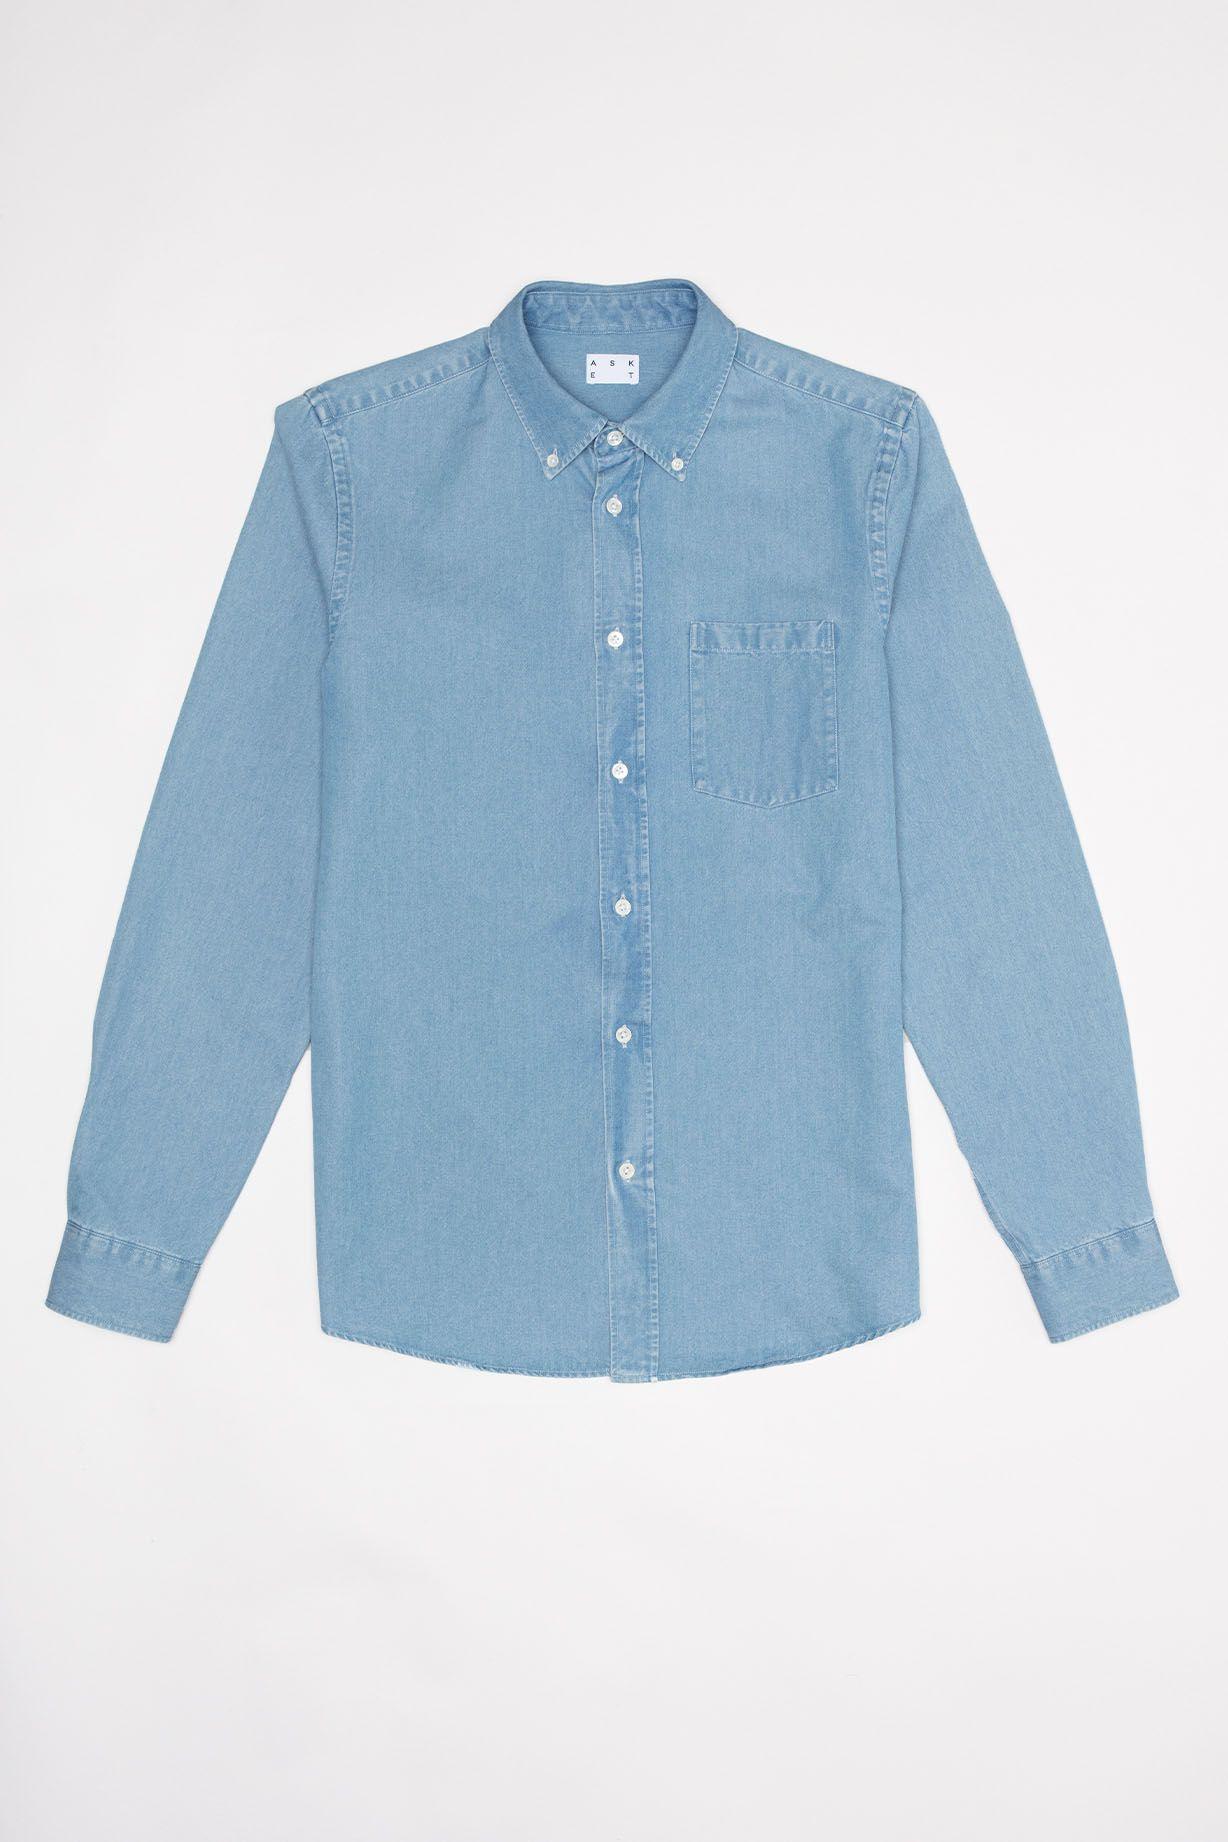 58ea0053f6a The Denim Shirt  Men s Washed Button Down Denim Shirt